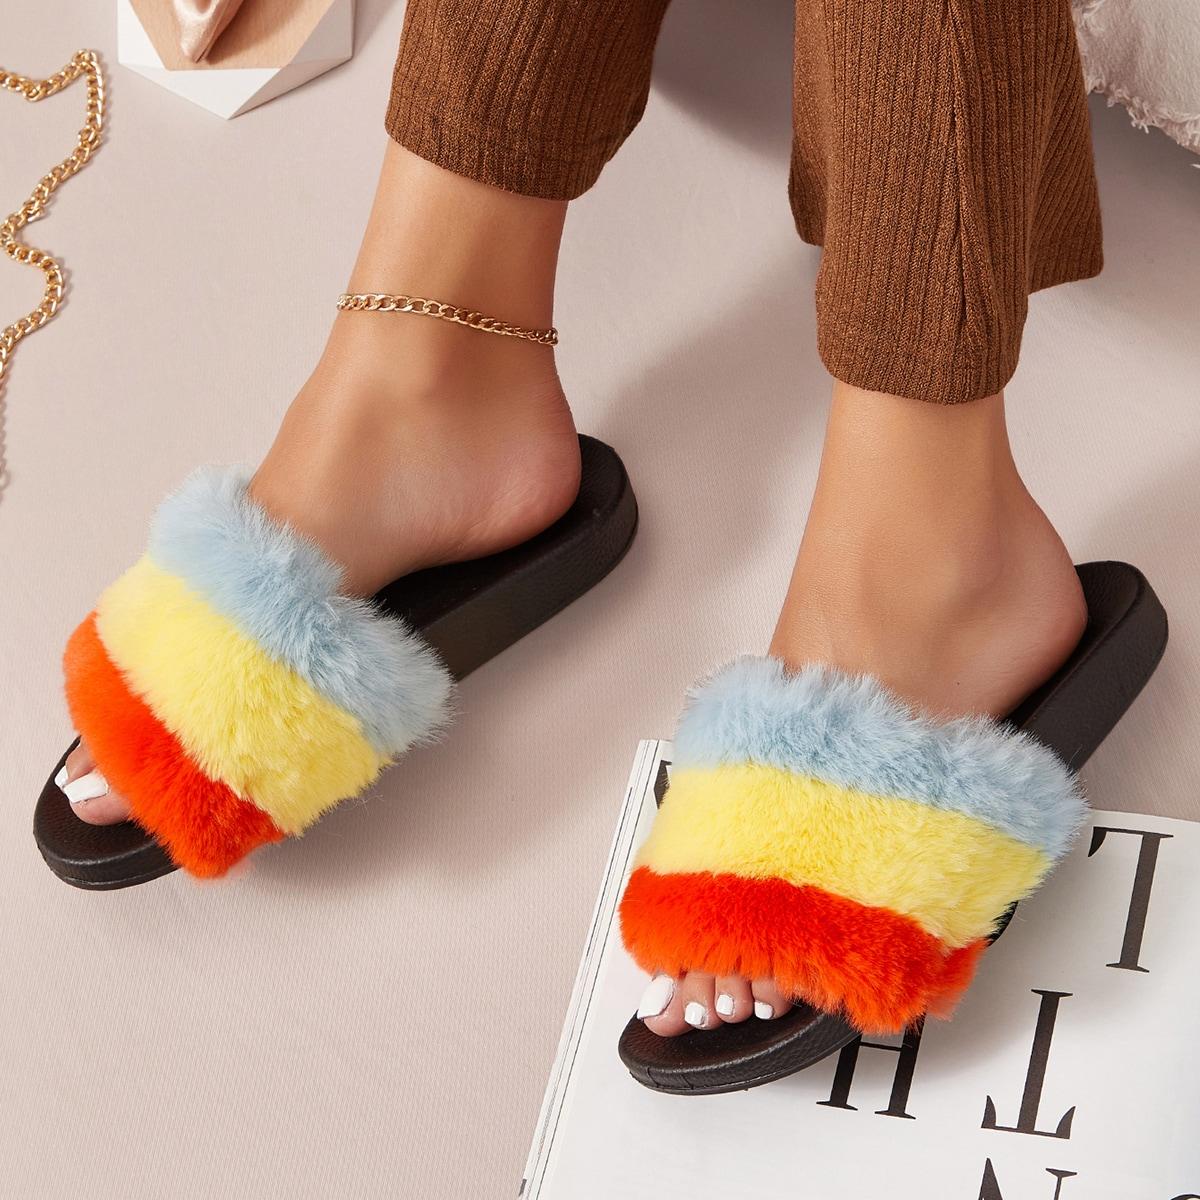 SHEIN / Tie-Dye Faux Fur Vamp Slide Sandals